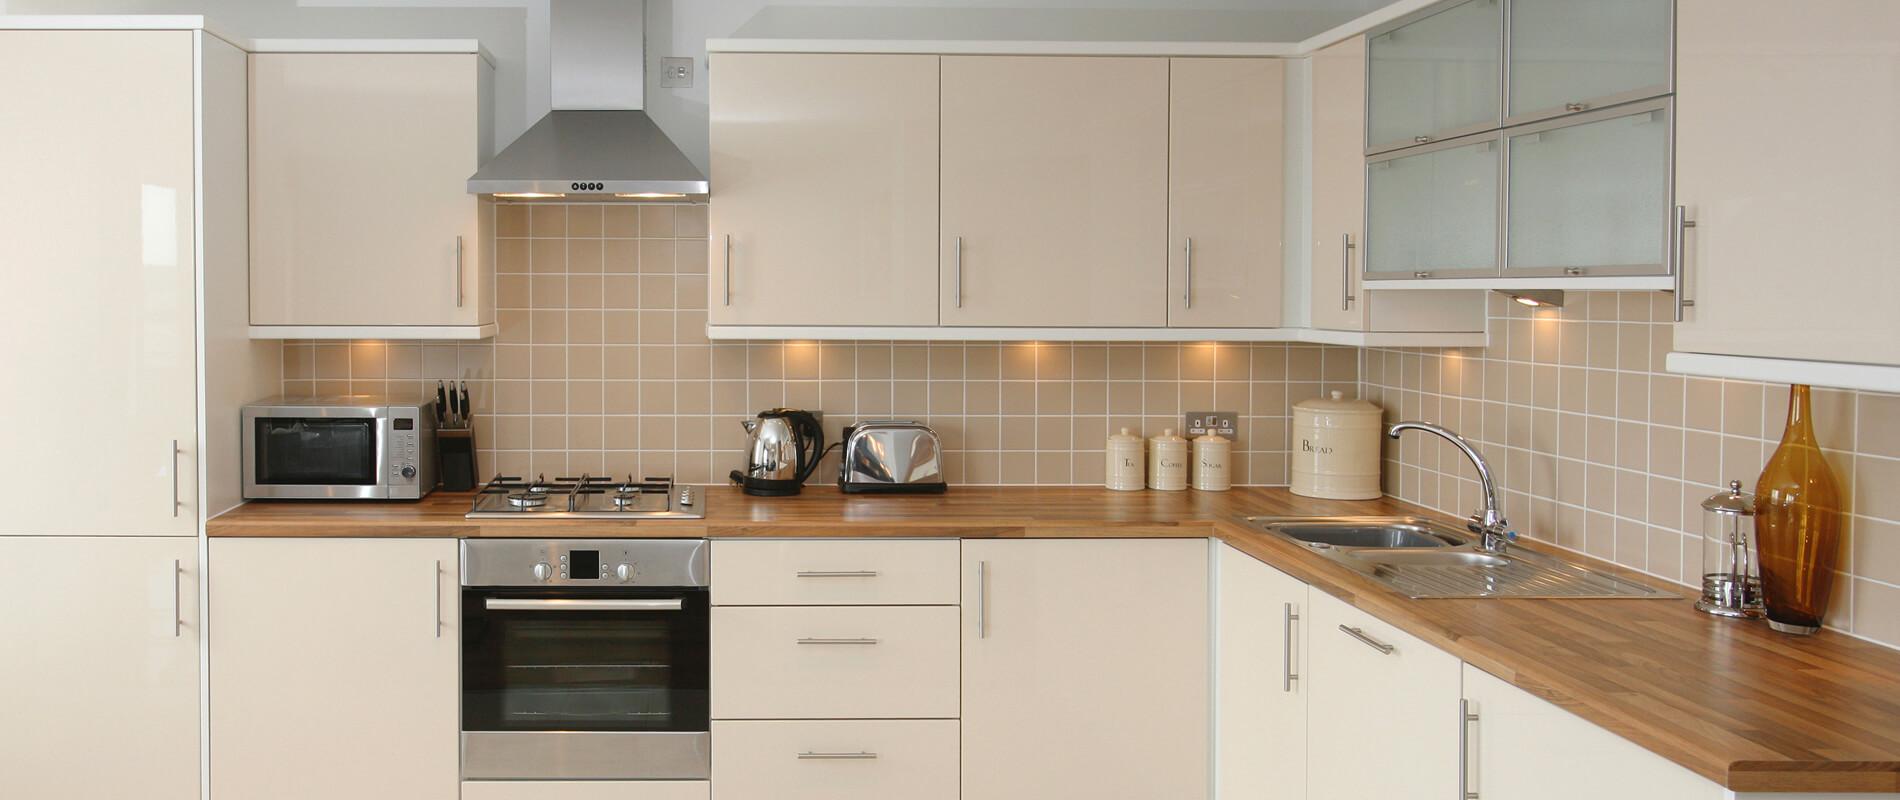 cincinnati kitchen remodeling tips kitchen remodel cincinnati Craftsmen Home Improvements Inc